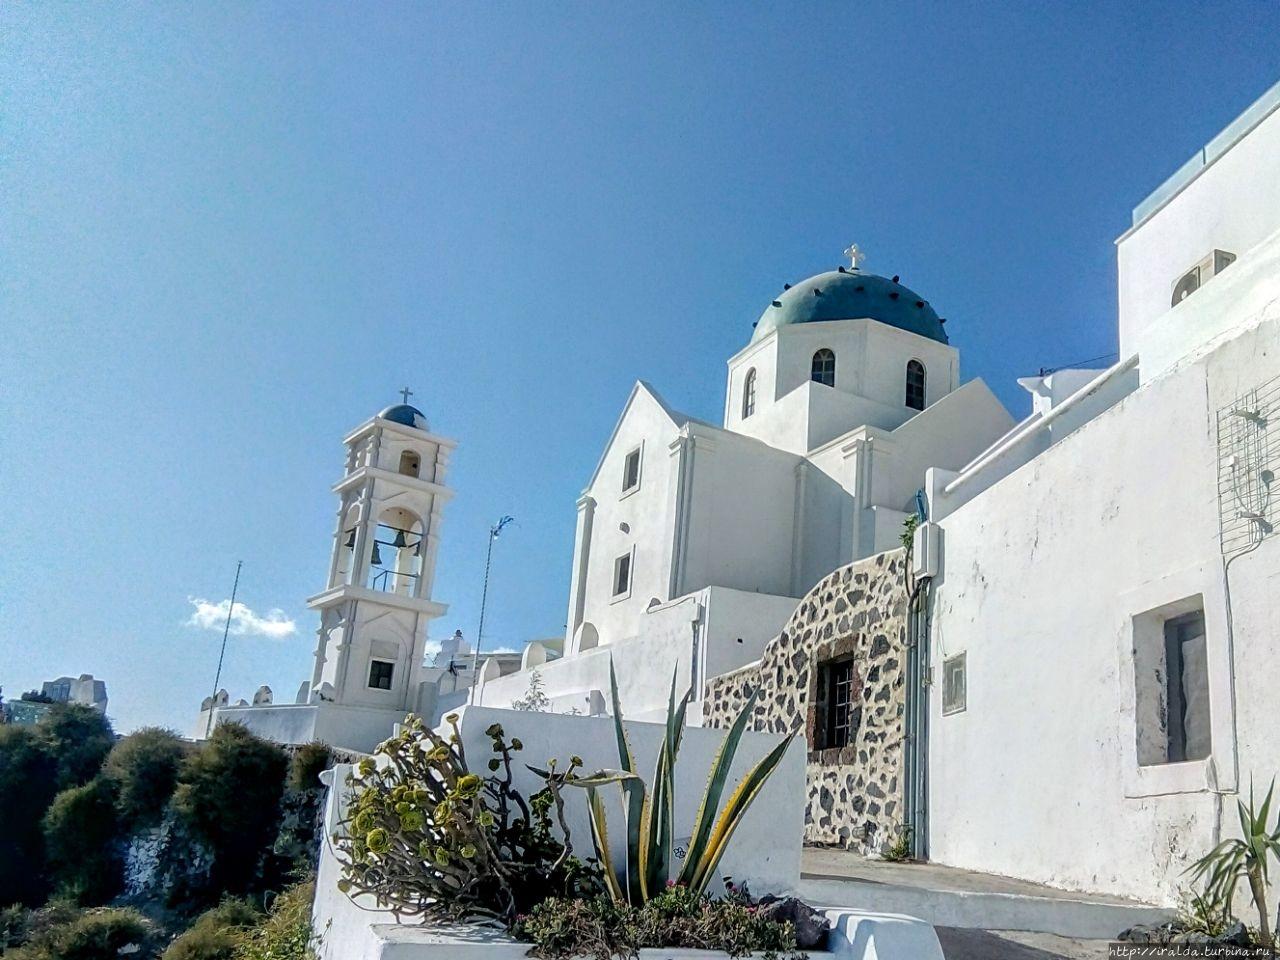 Фиростефани. Имеровигли. Скарос Имеровигли, остров Санторини, Греция